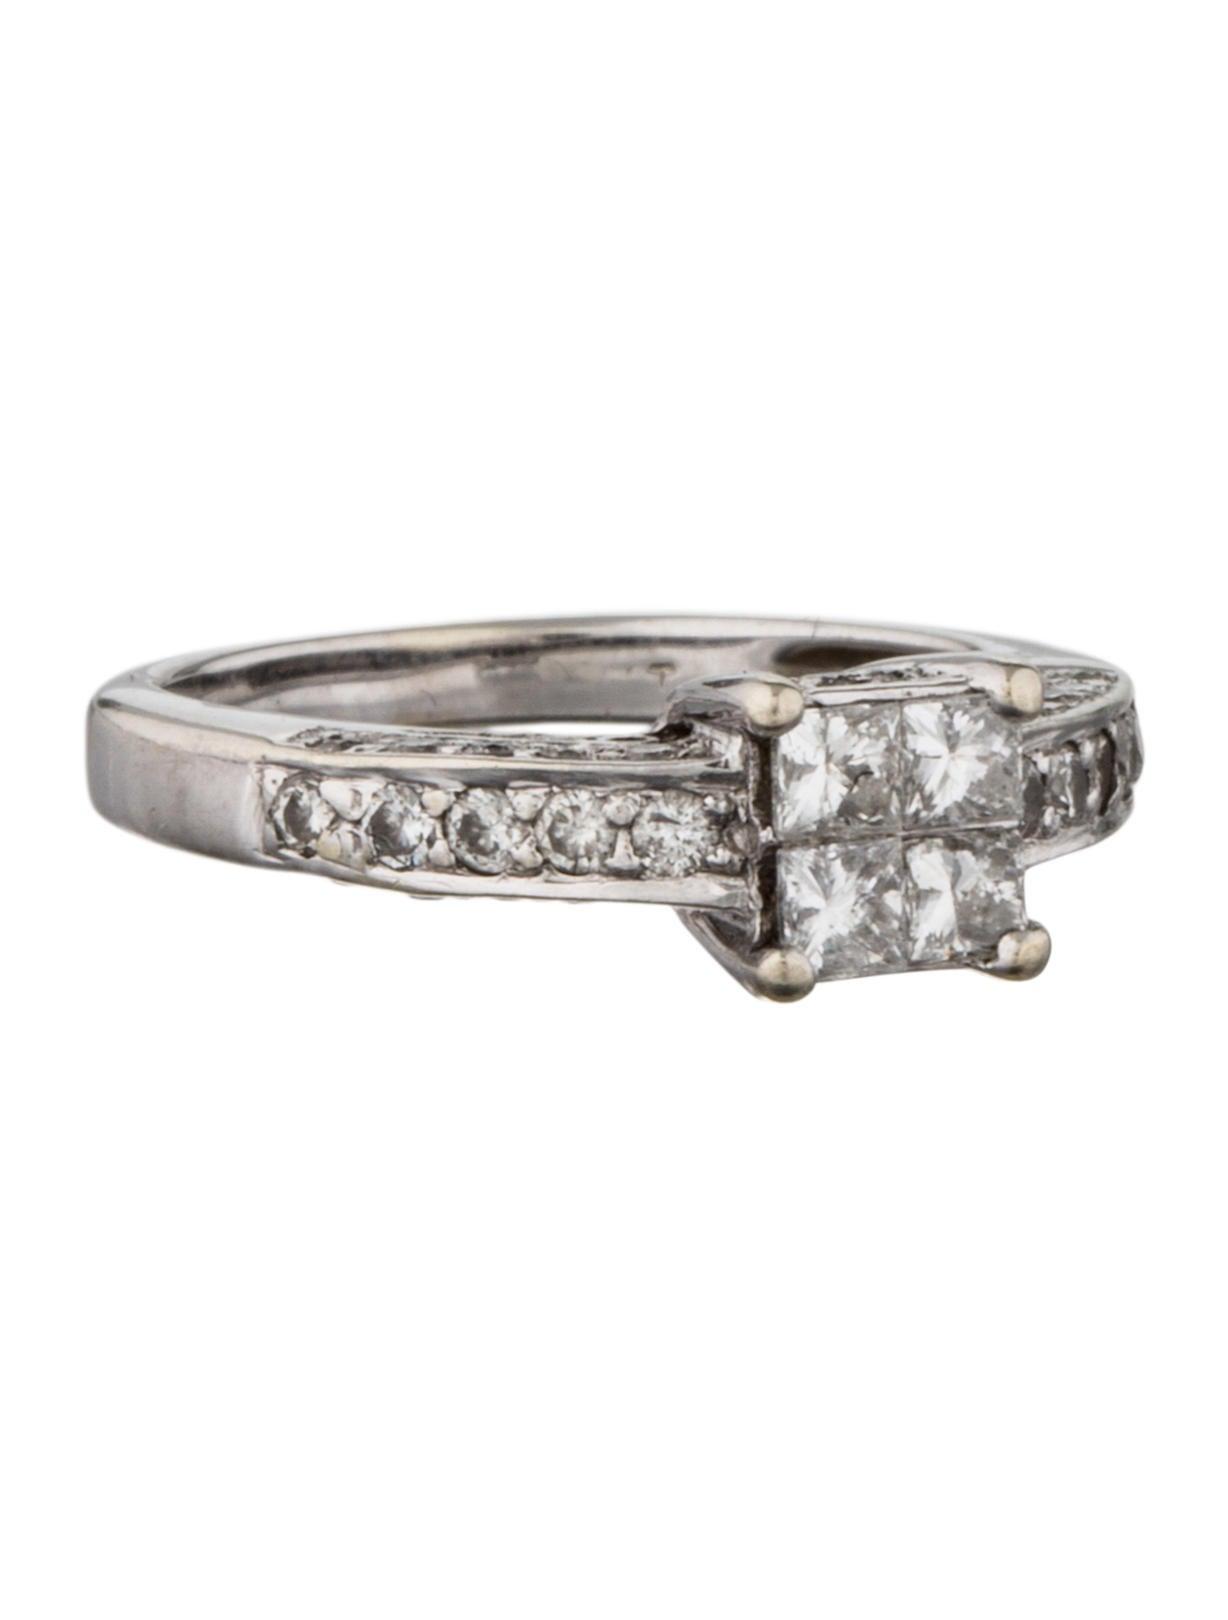 diamond cluster engagement ring rings fjr28077 the. Black Bedroom Furniture Sets. Home Design Ideas